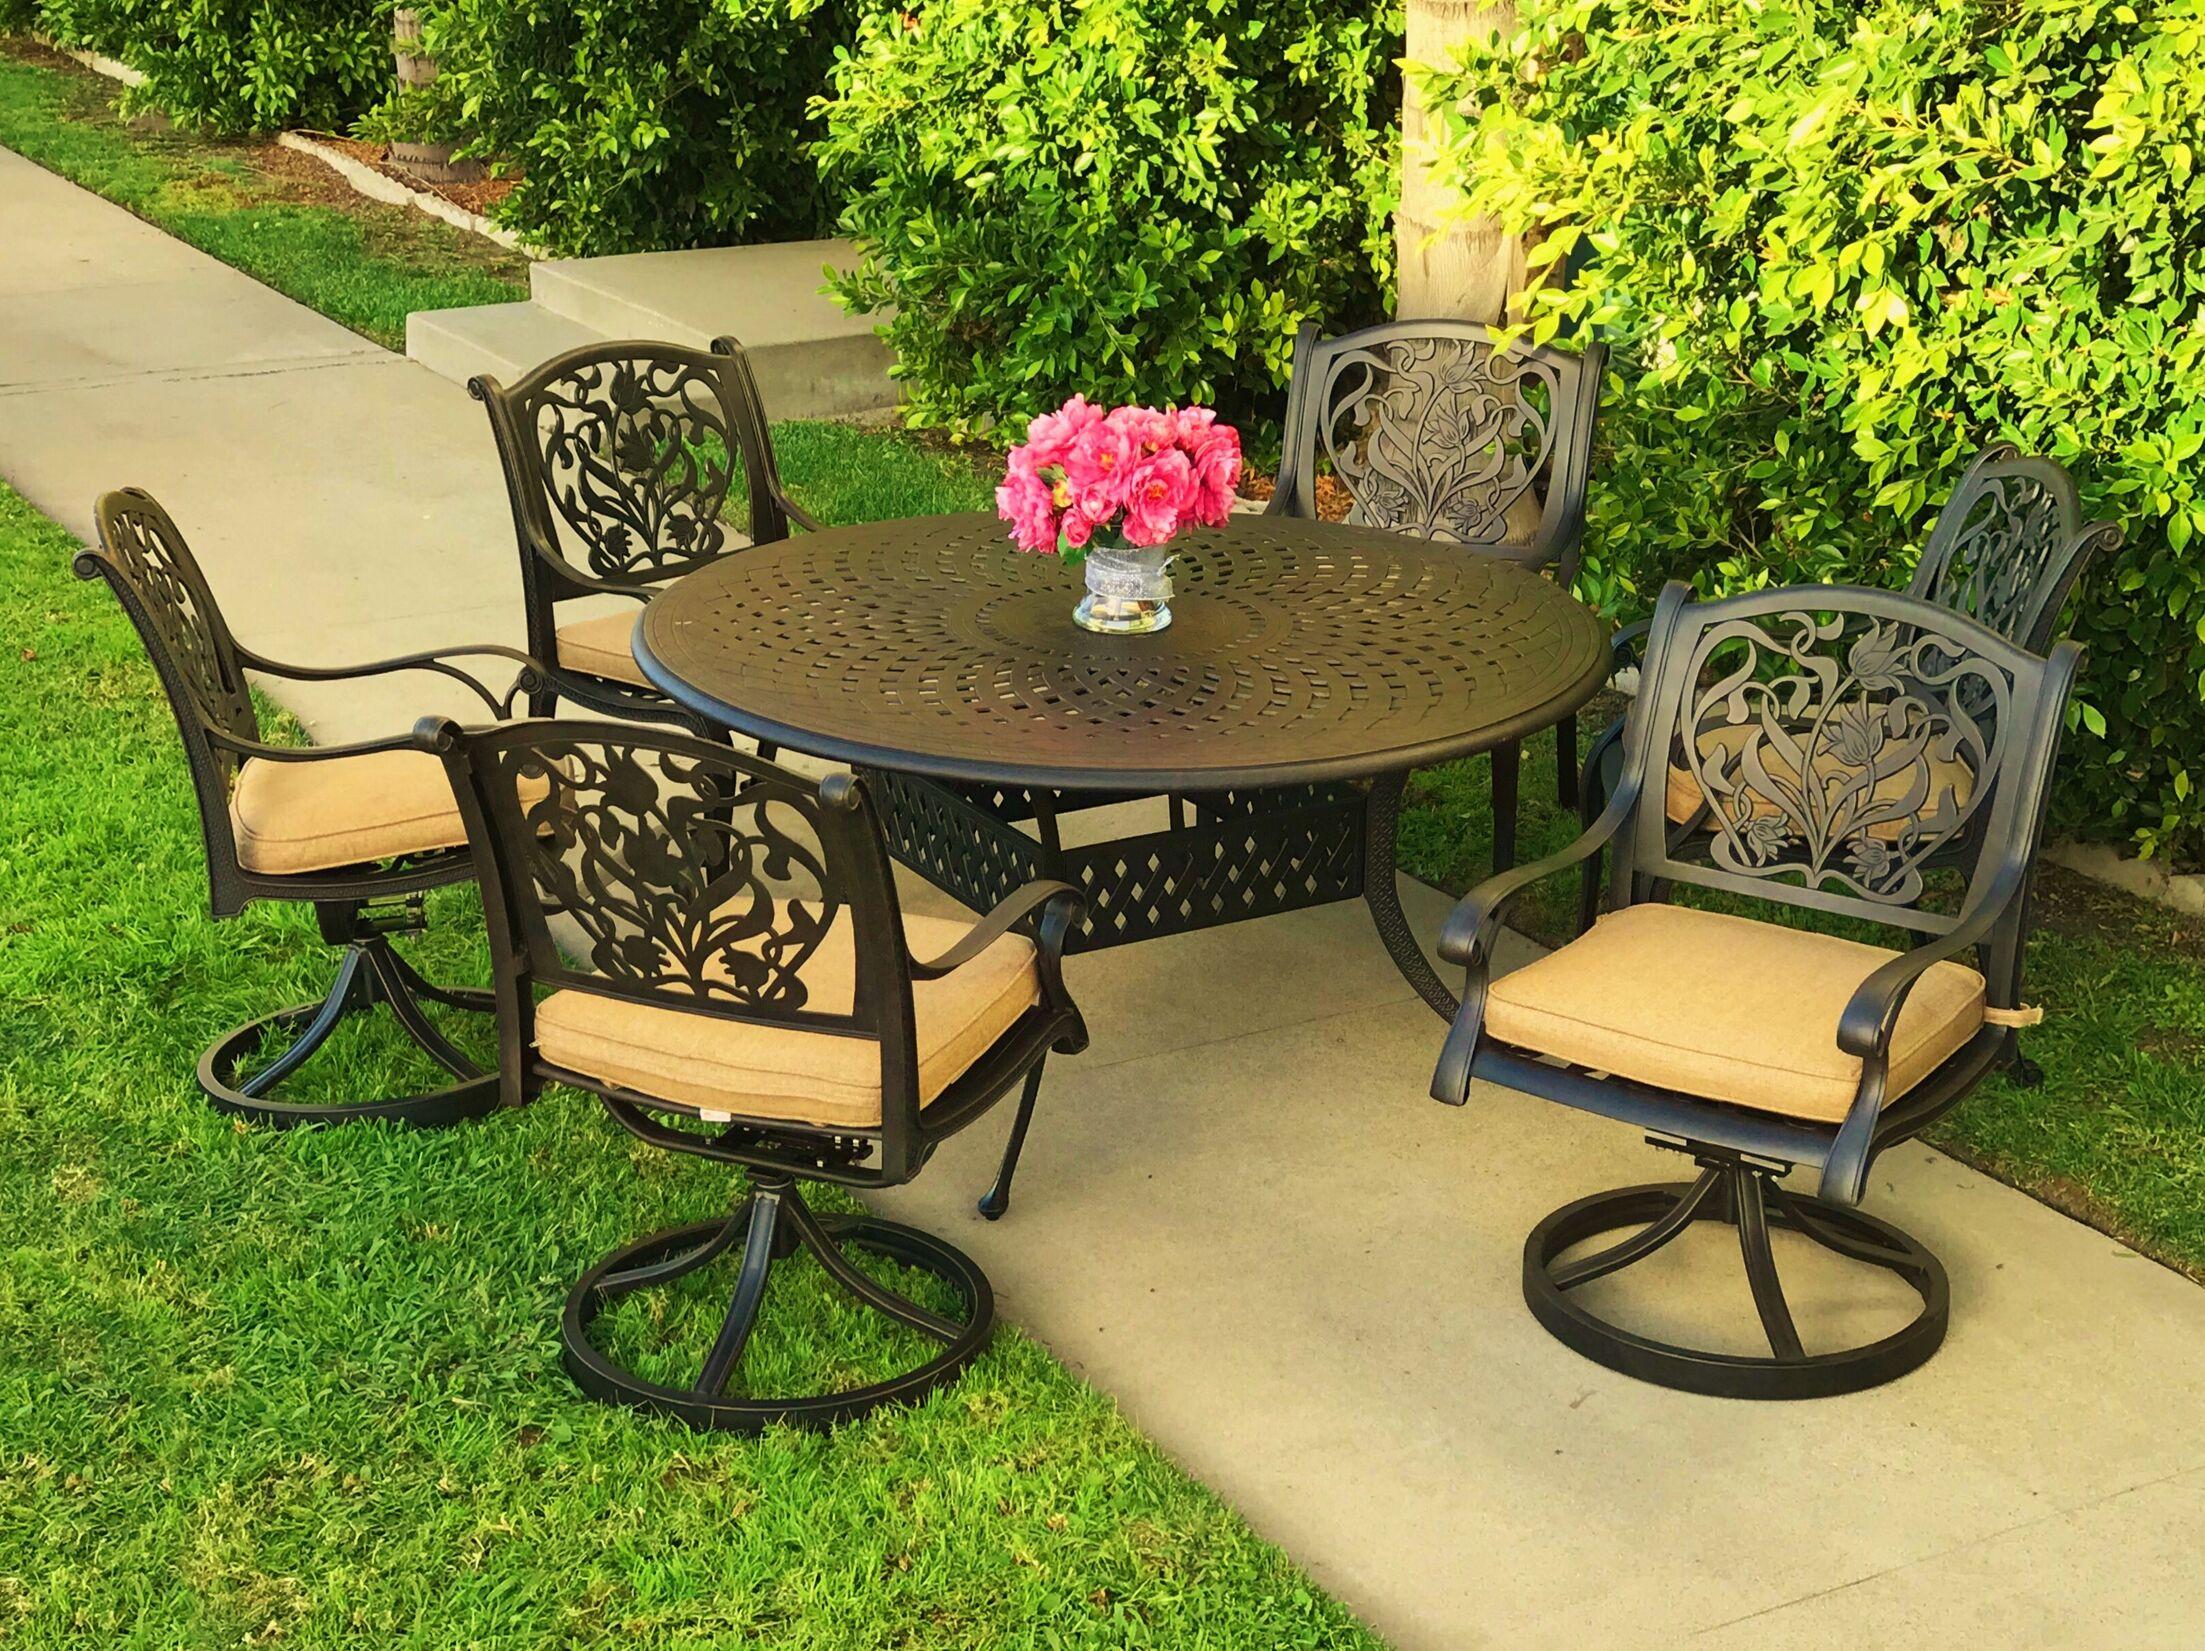 Camptown 7 Piece Sunbrella Dining Set with Cushions